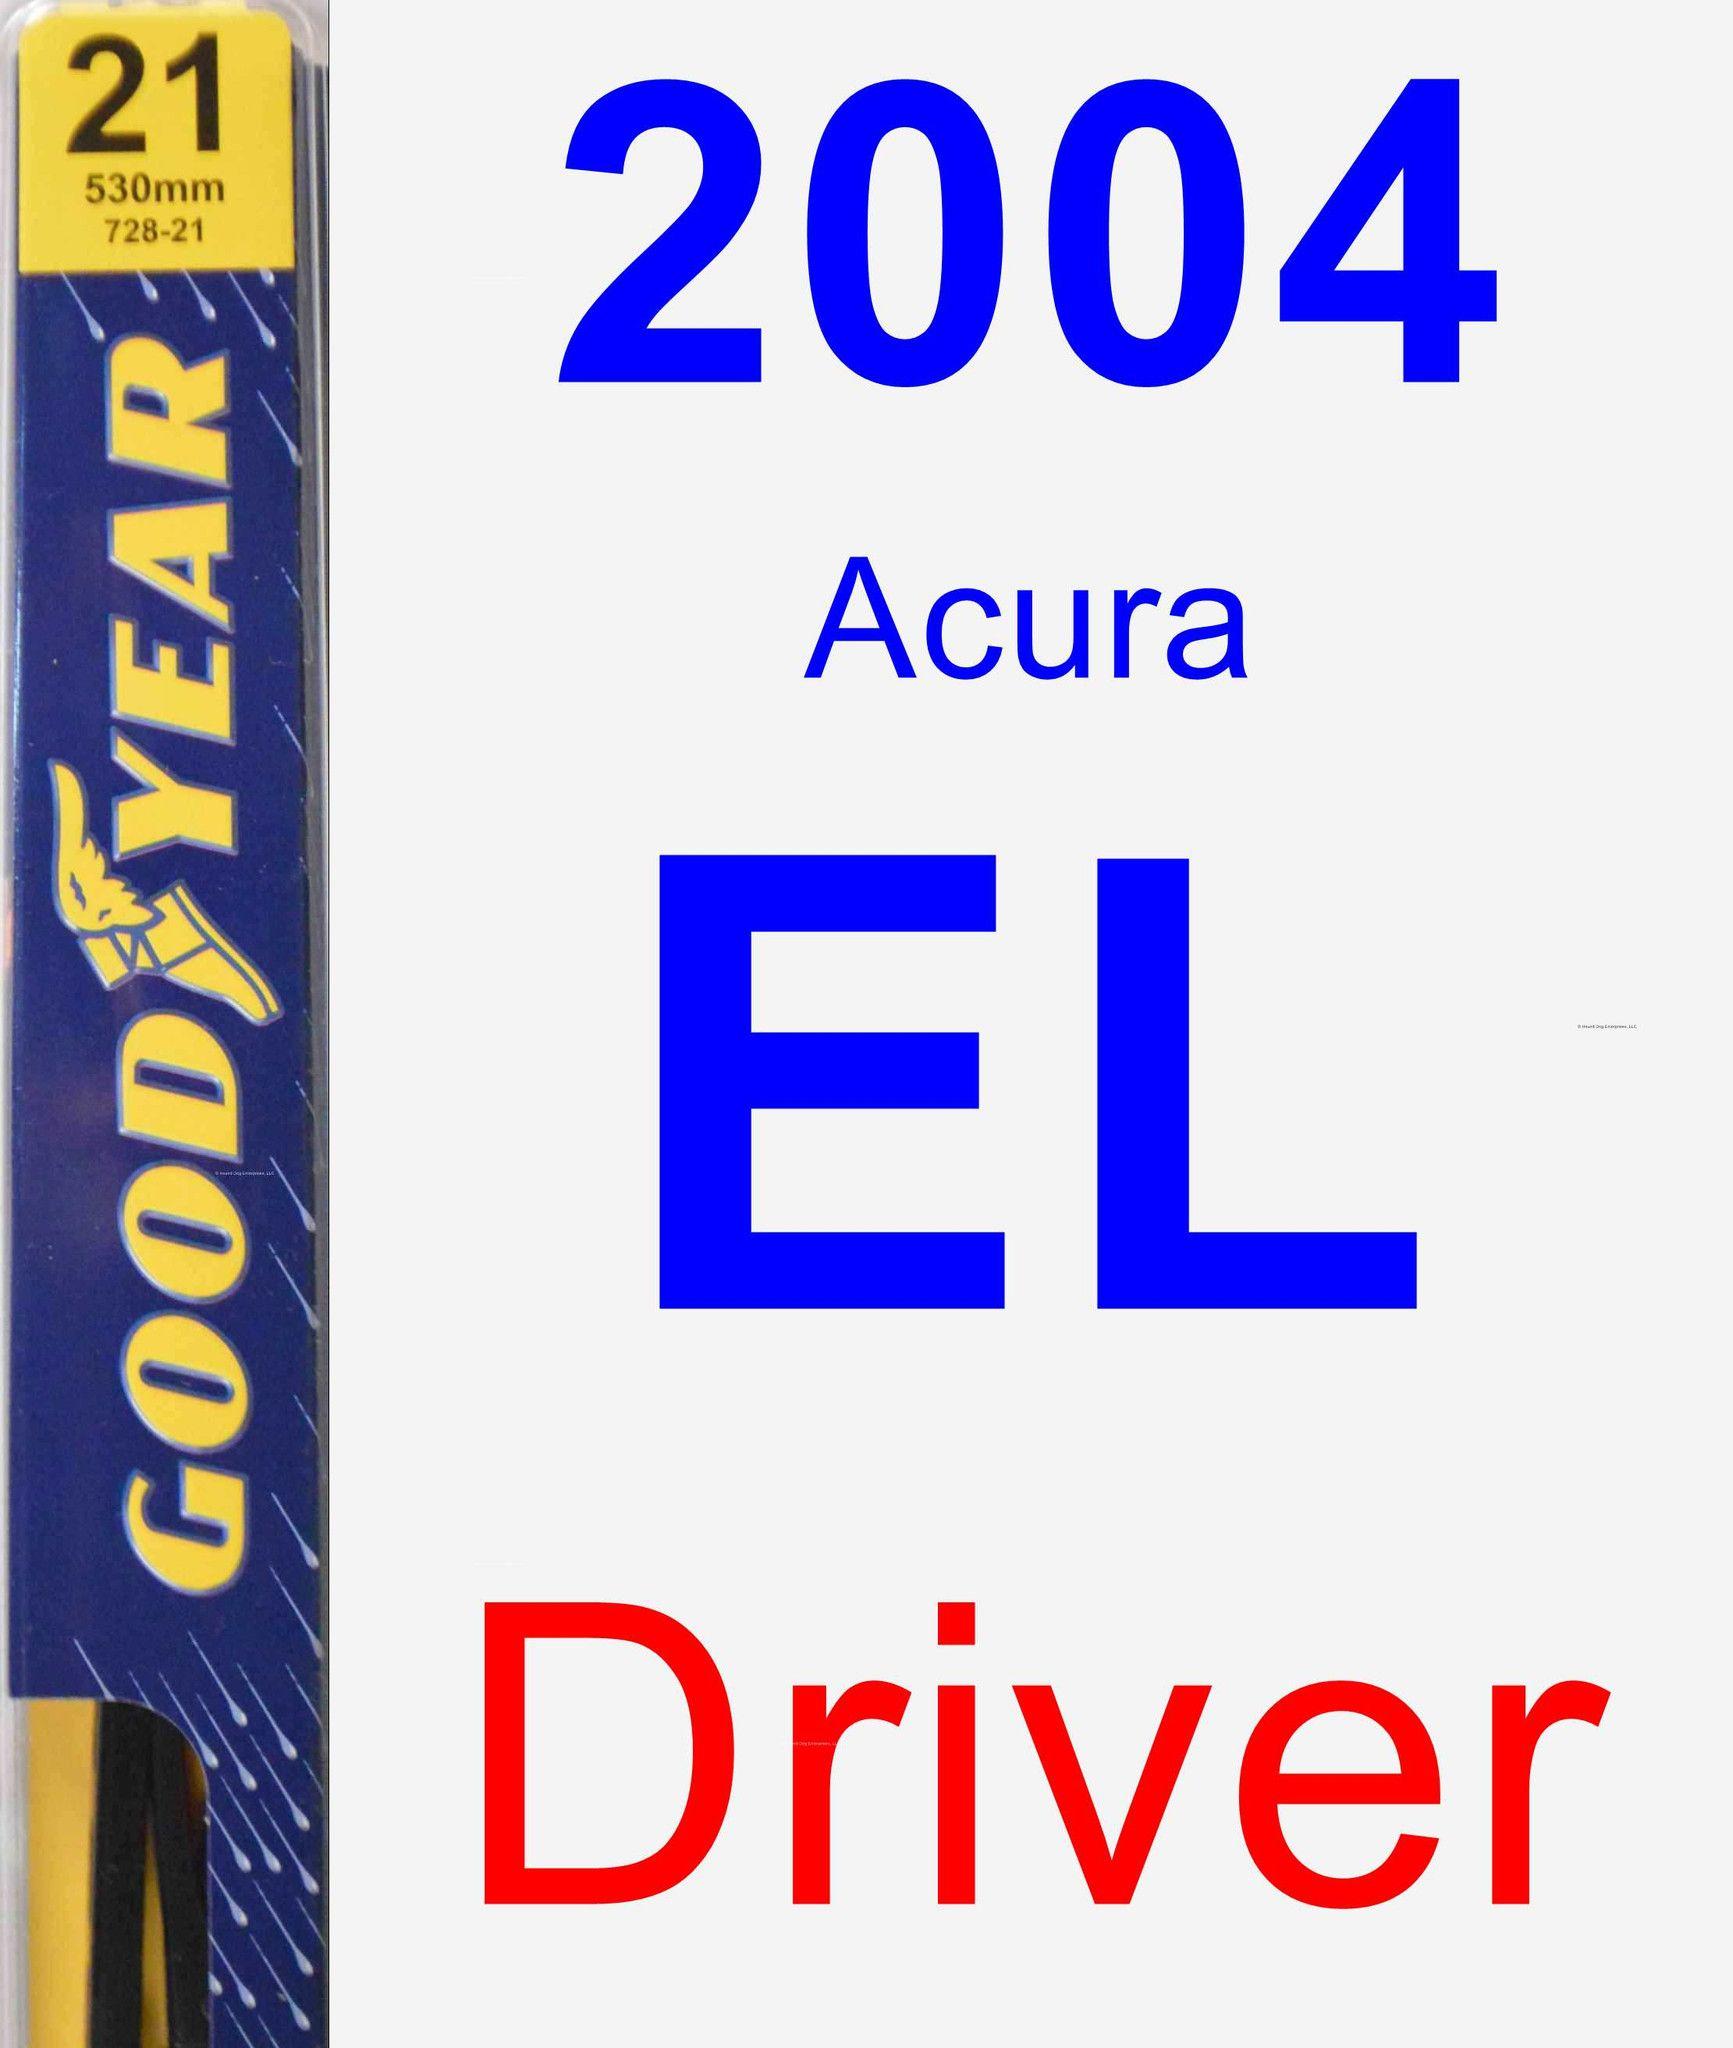 Driver Wiper Blade For 2004 Acura EL - Premium